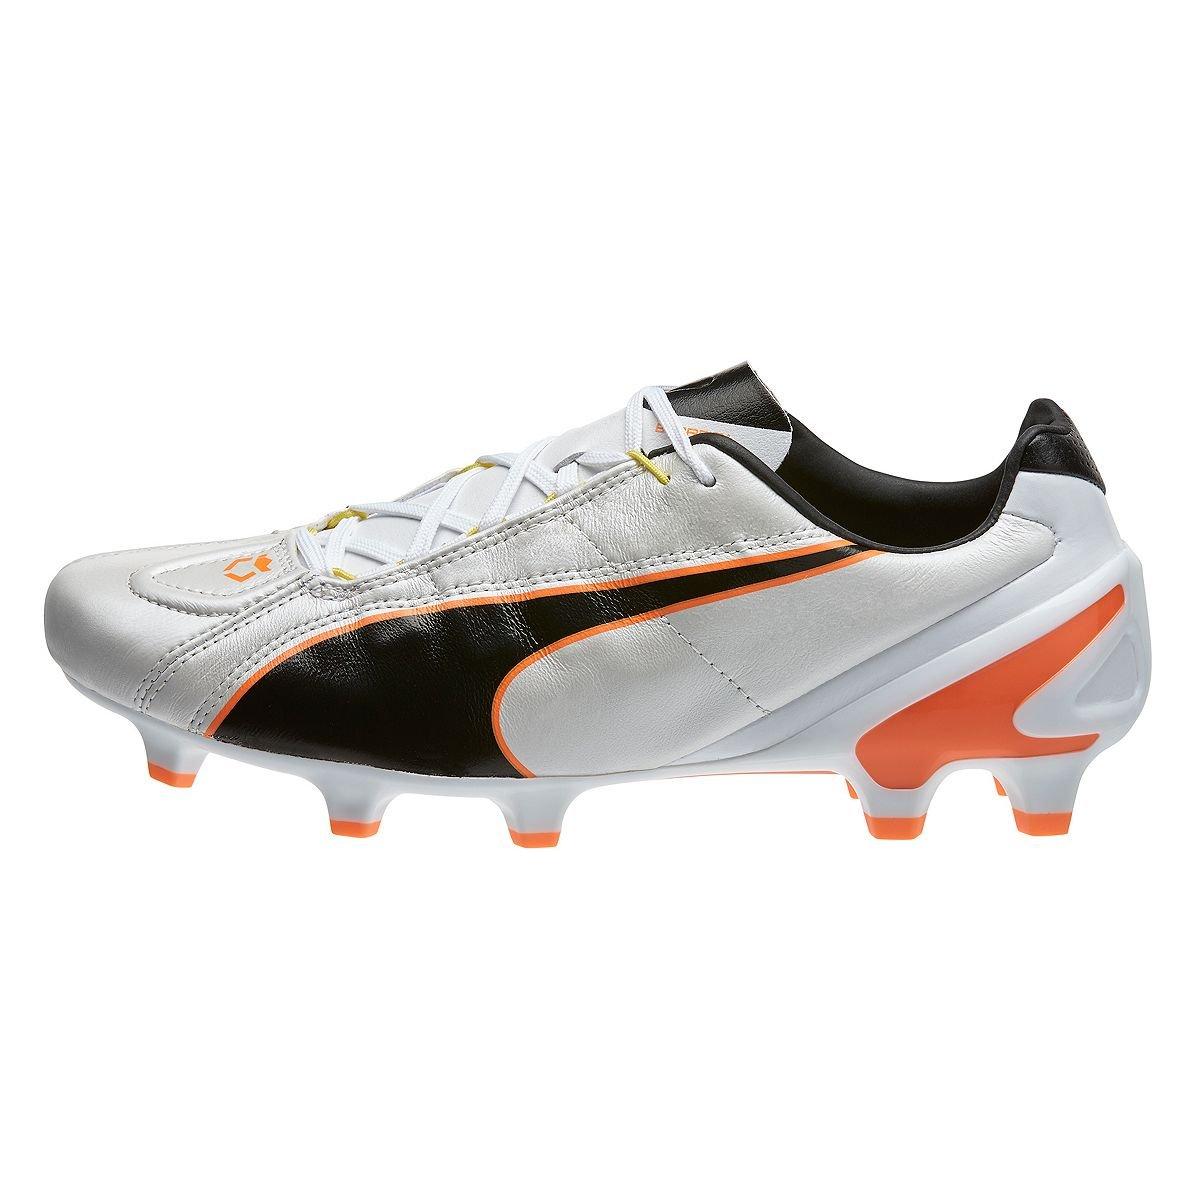 Puma King II EF + FG Soccer Cleats B00QNTU9A8 11|White-Black-Fluo Flash Orange White-Black-Fluo Flash Orange 11